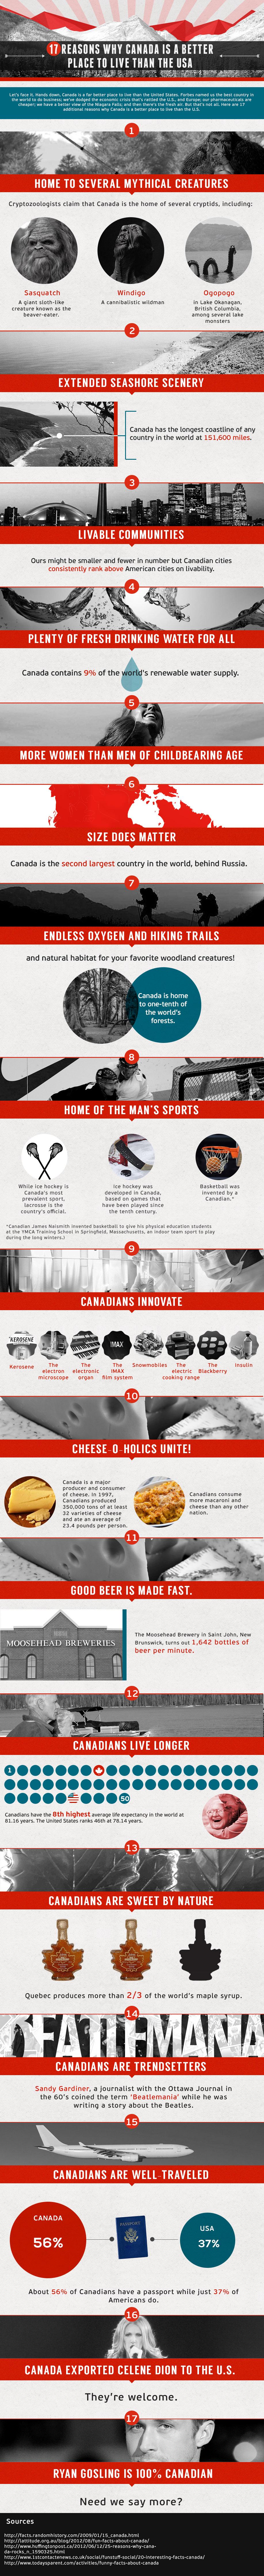 Canada vs. USA Infographic